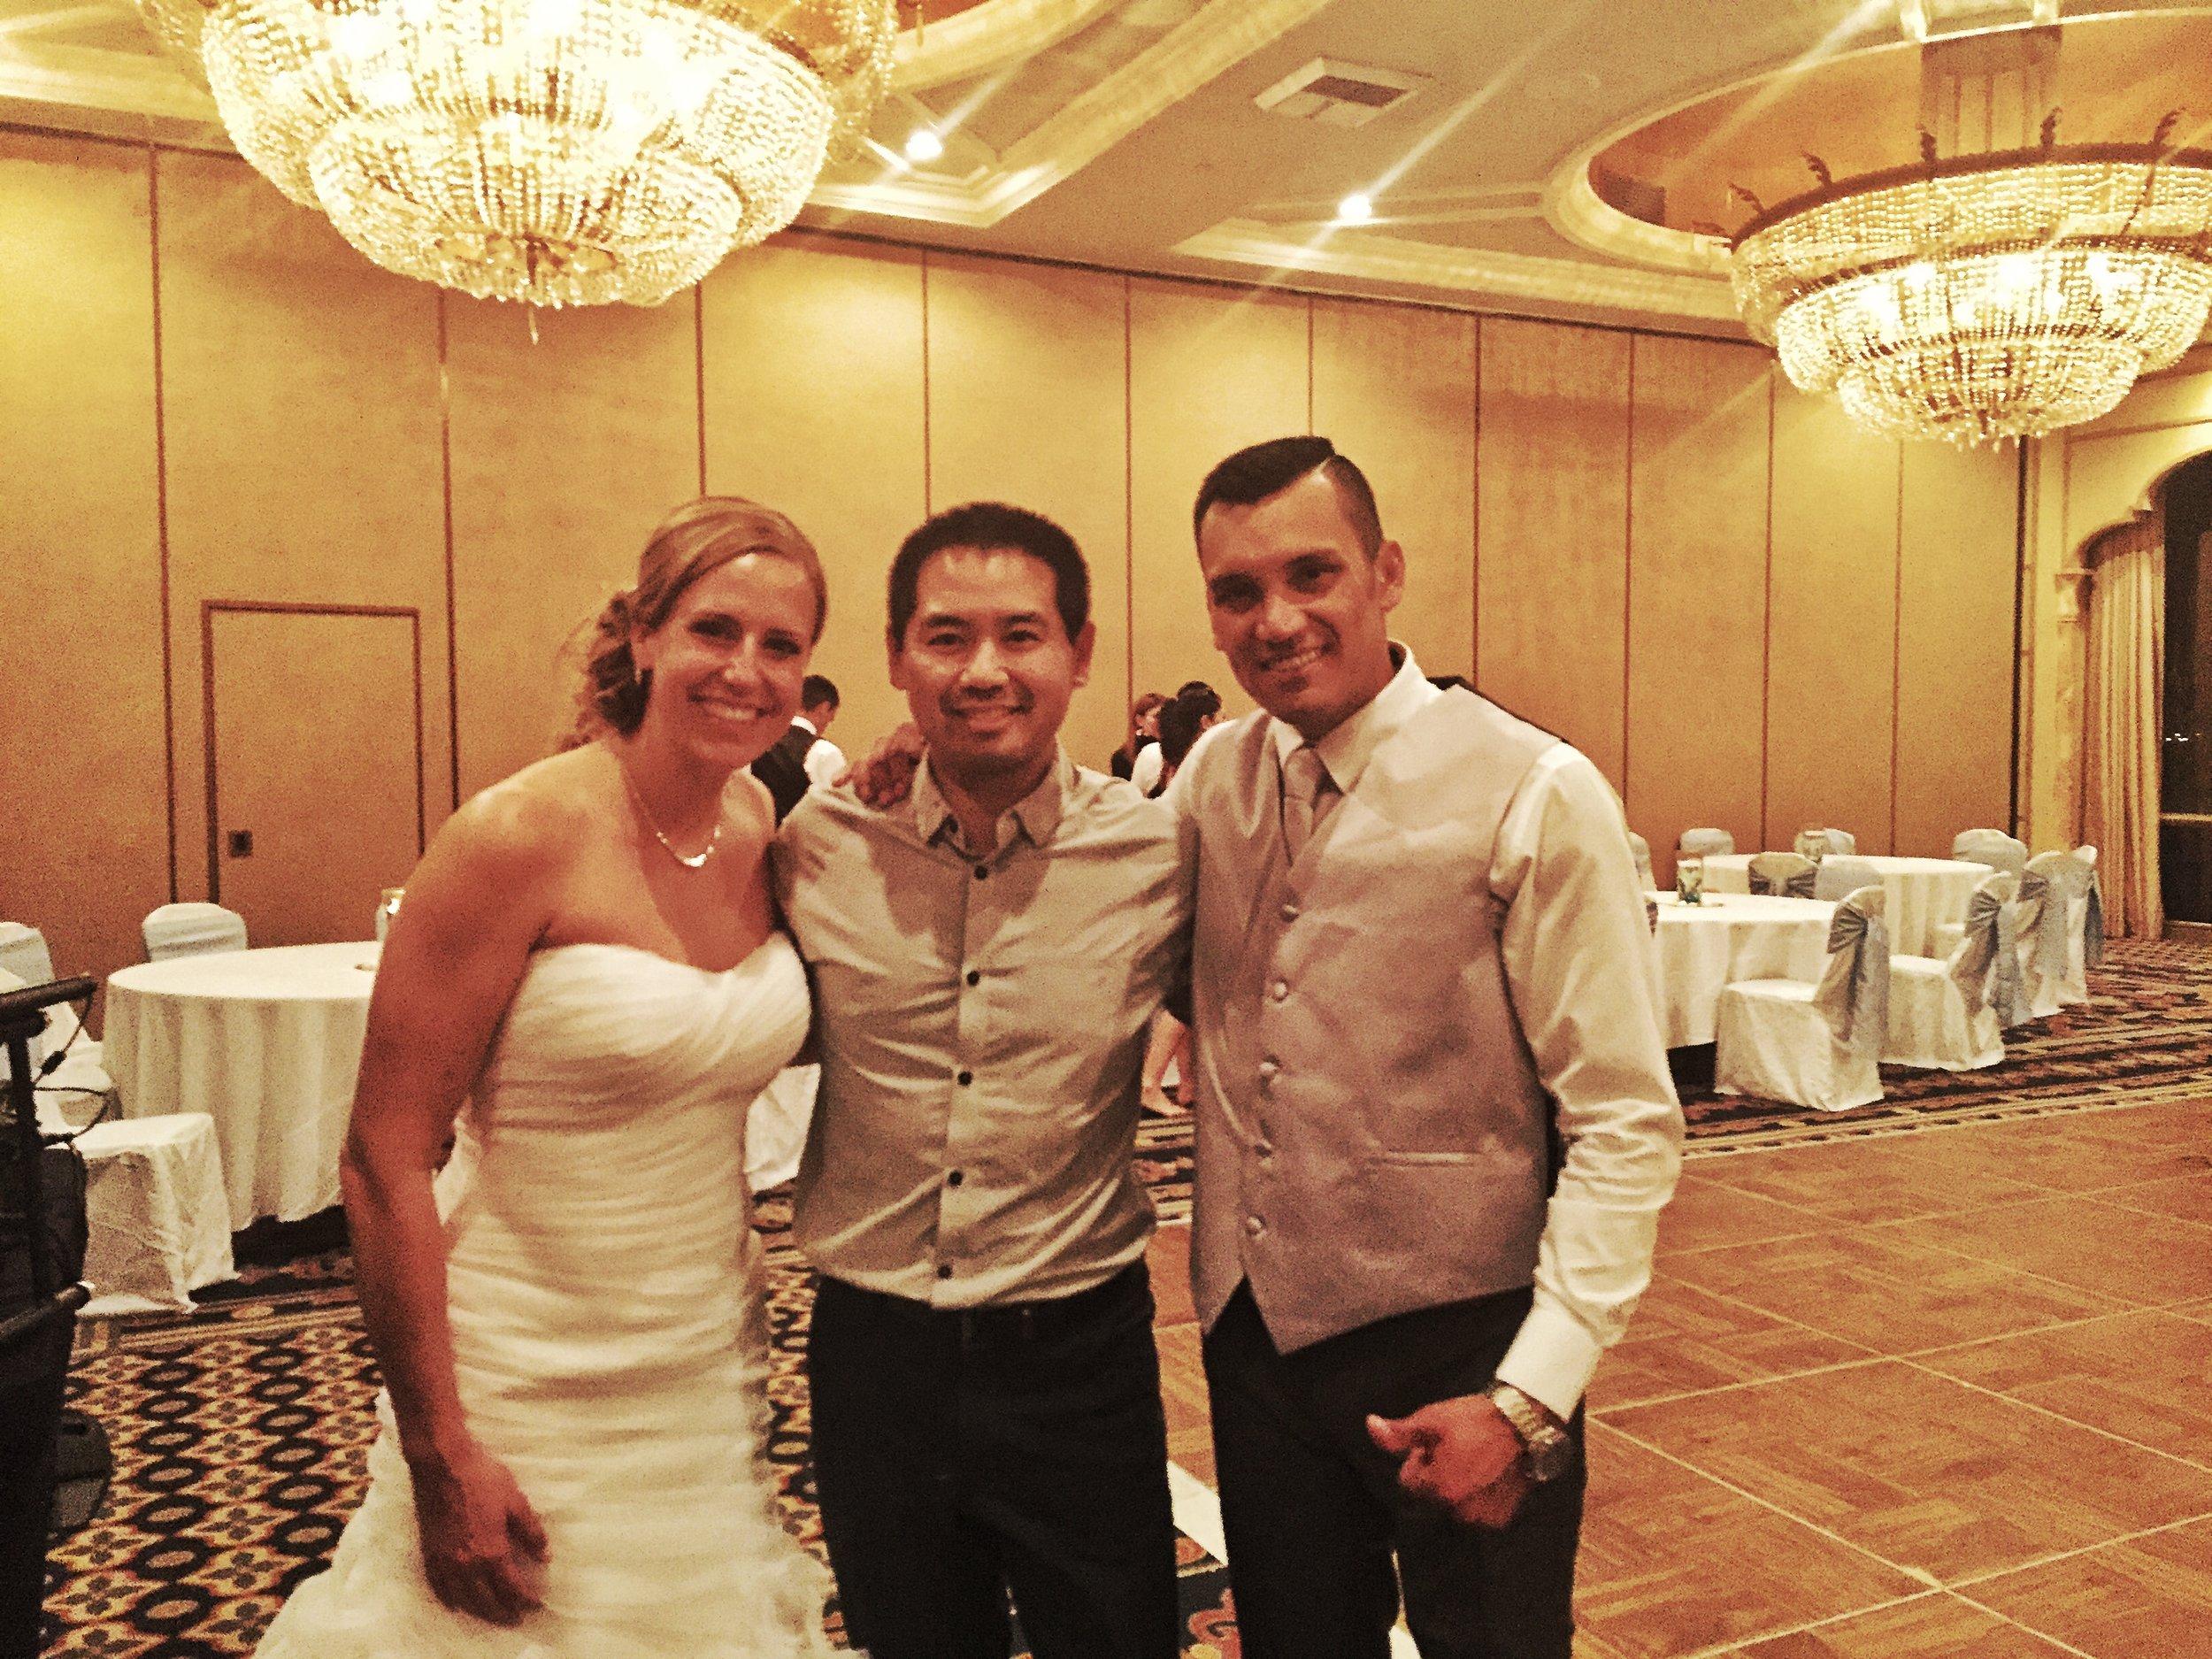 San Diego wedding DJ Justin Kanoya with Nichole and Johan at their wedding at the Bahia in San Diego.